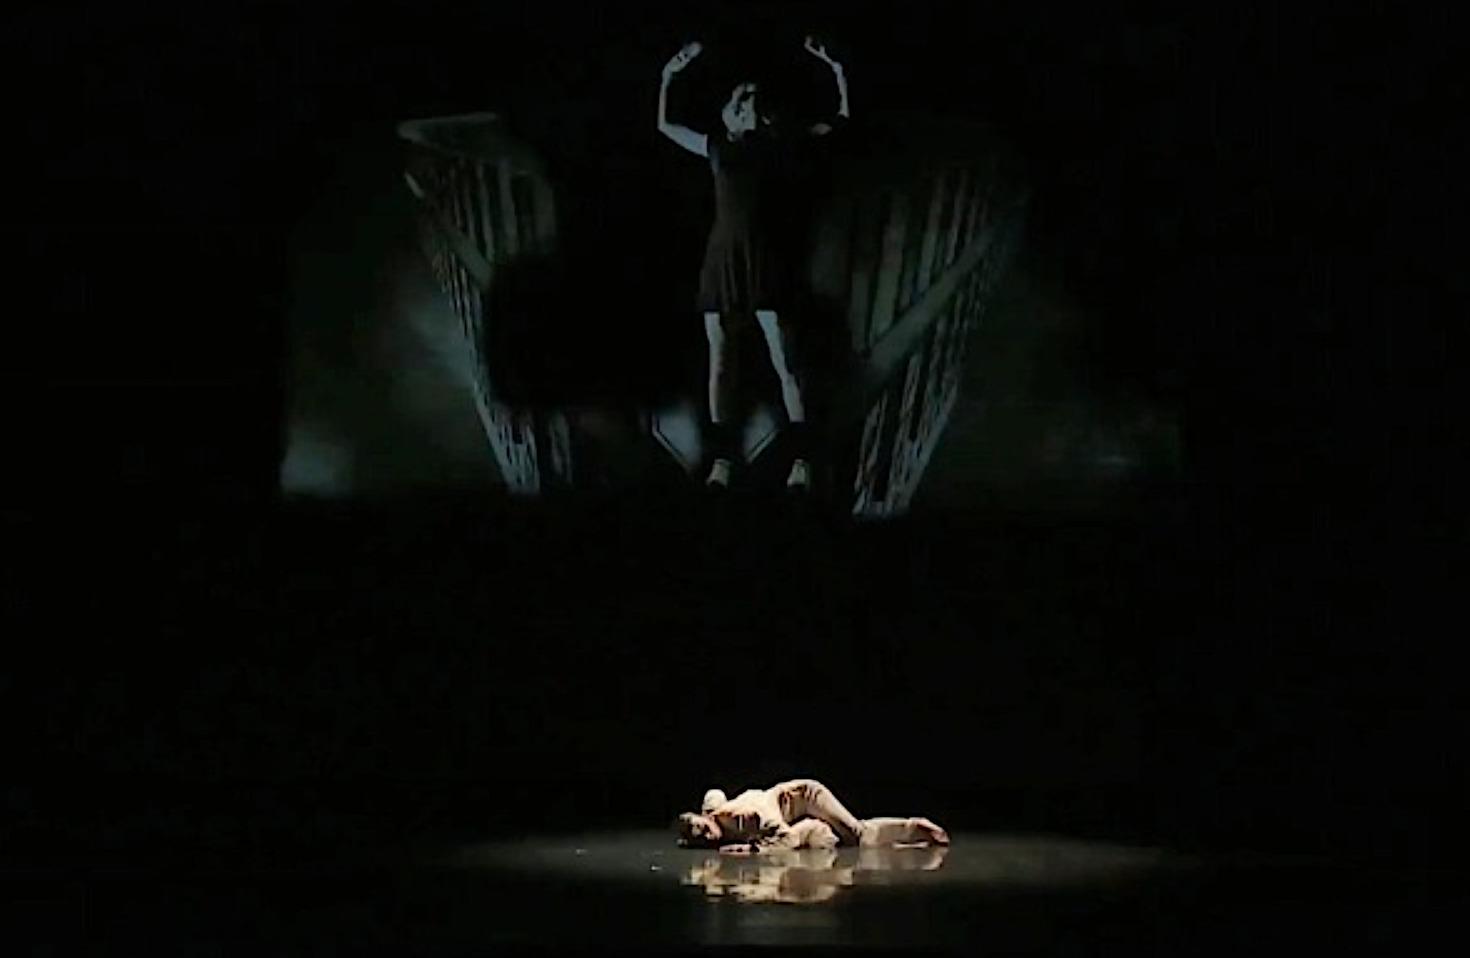 Biennale-Danza-di-Venezia_Nathalie-Larquet-_-Strategies-of-the-Imperceptible